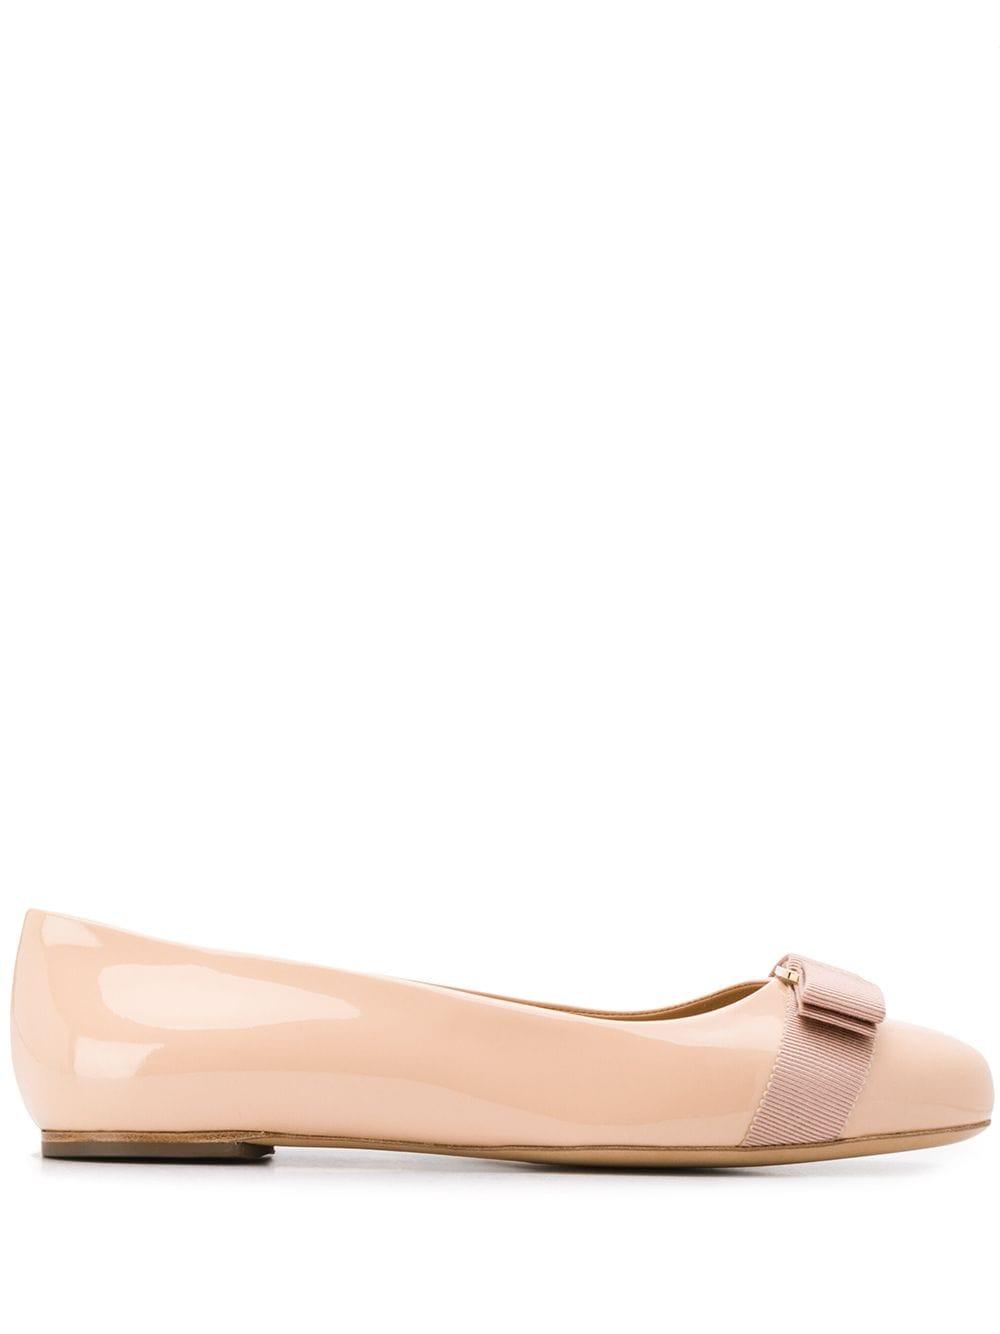 Varina* Leather Ballets